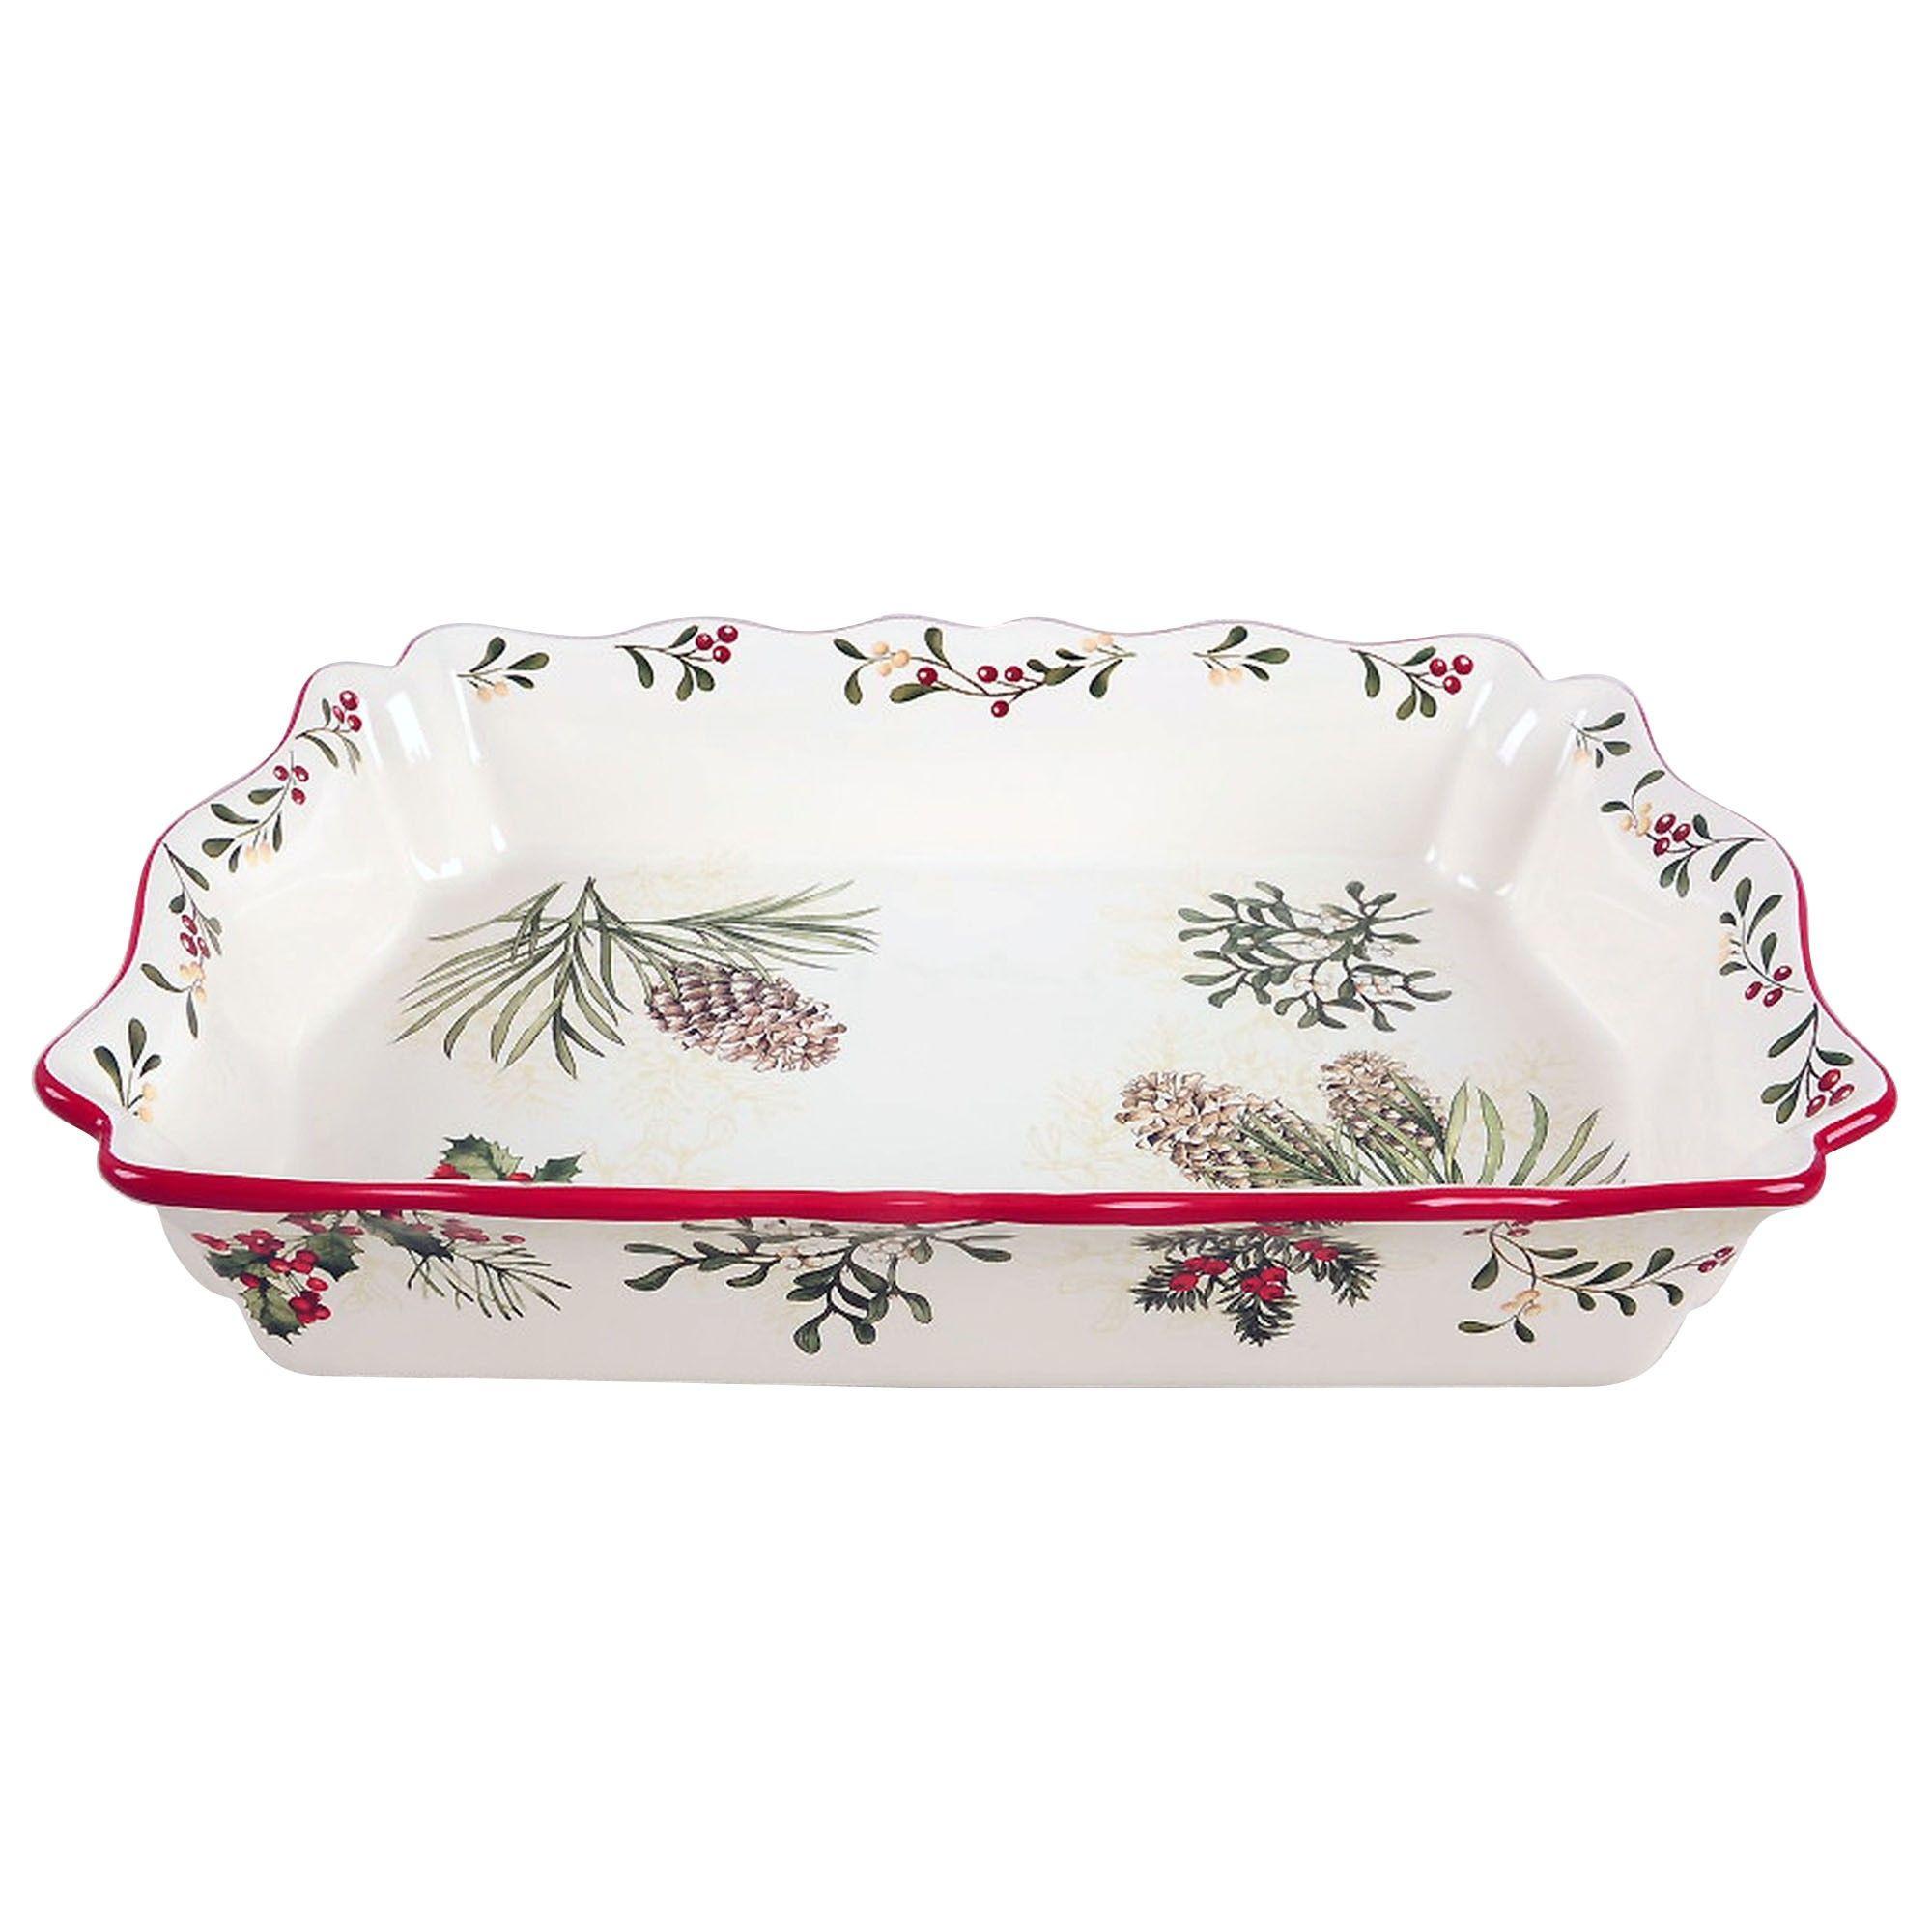 38b3beb3c859f11b40710b398f139105 - Better Homes And Gardens Christmas Dishes 2018